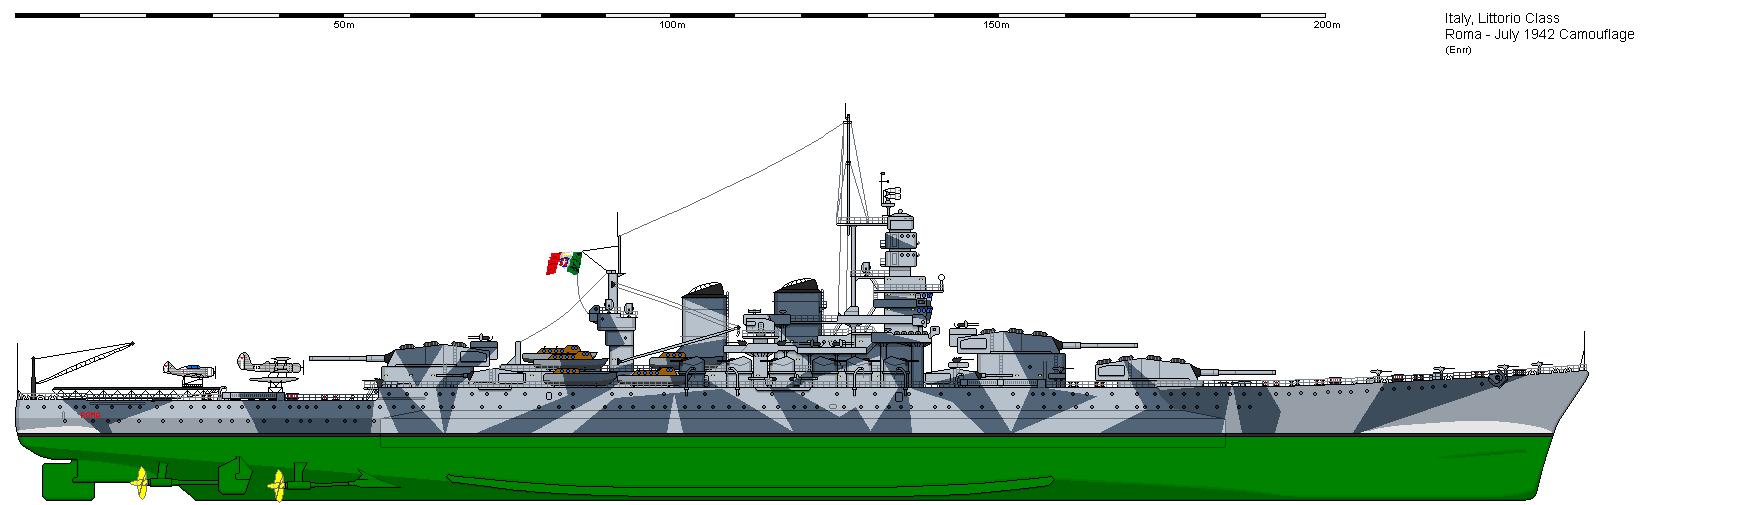 Image by Shipbucket